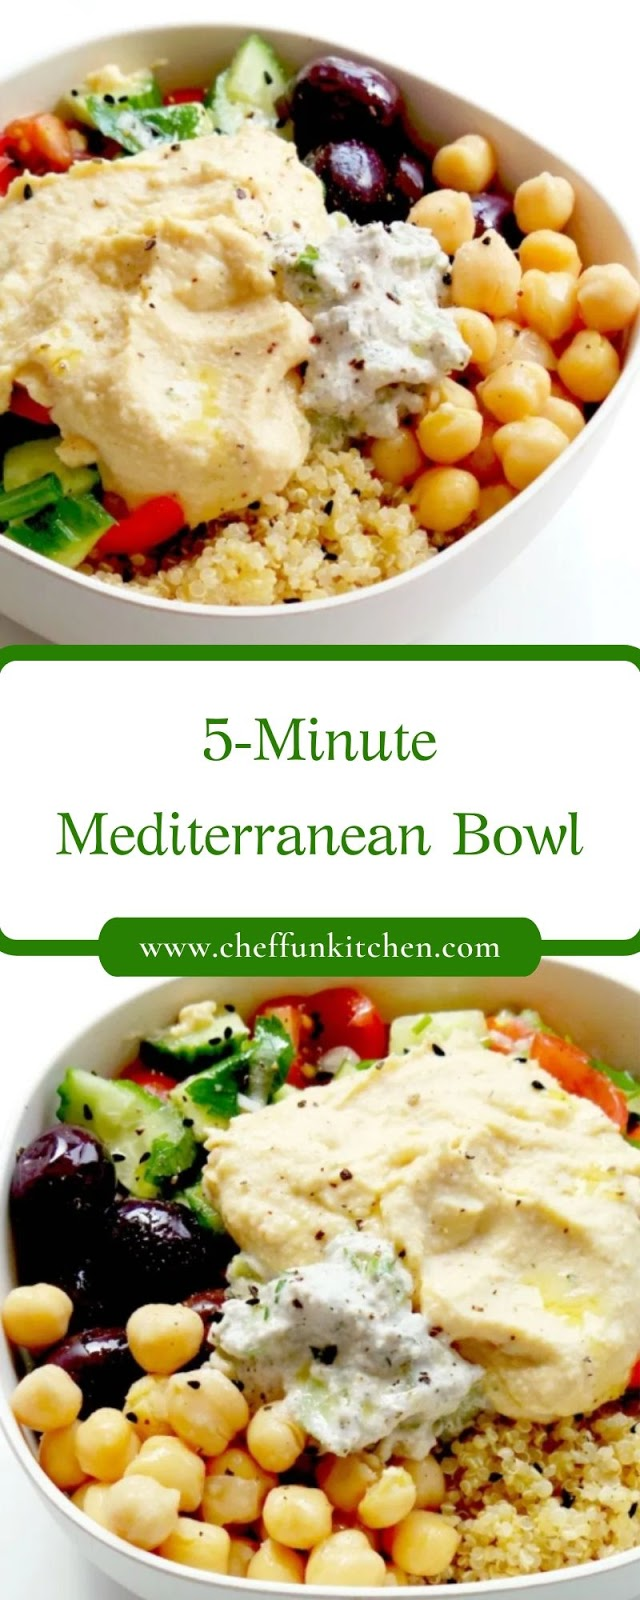 5-Minute Mediterranean Bowl